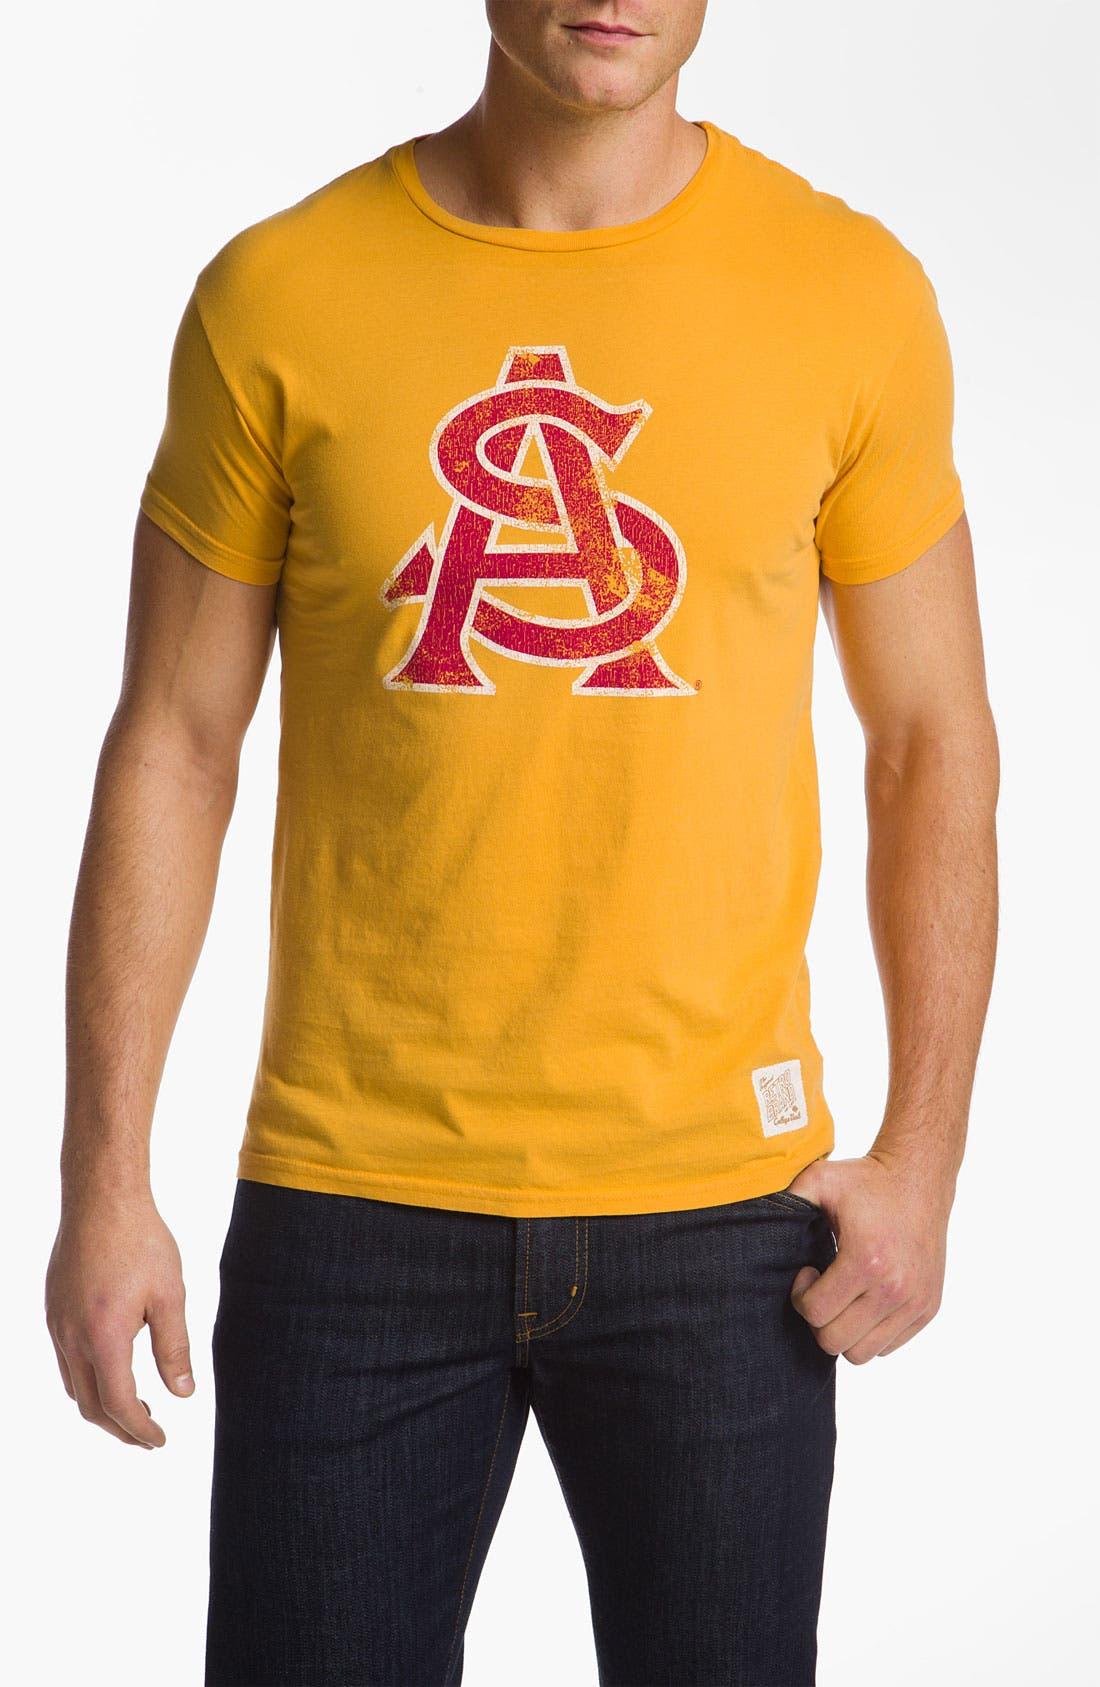 Alternate Image 1 Selected - Retro Brand 'Arizona State Sun Devils' T-Shirt